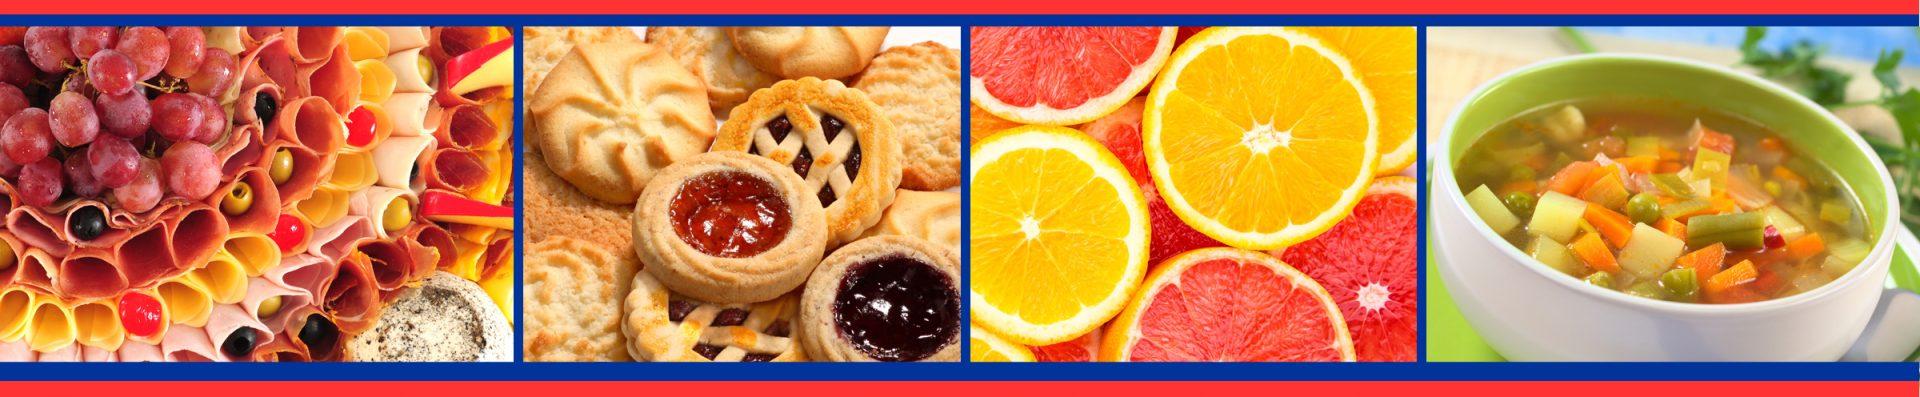 Hometown Markets Deli Platters, Bakery Cookies, Fresh Oranges Grapefruit, Chicken Noodle Soup and more